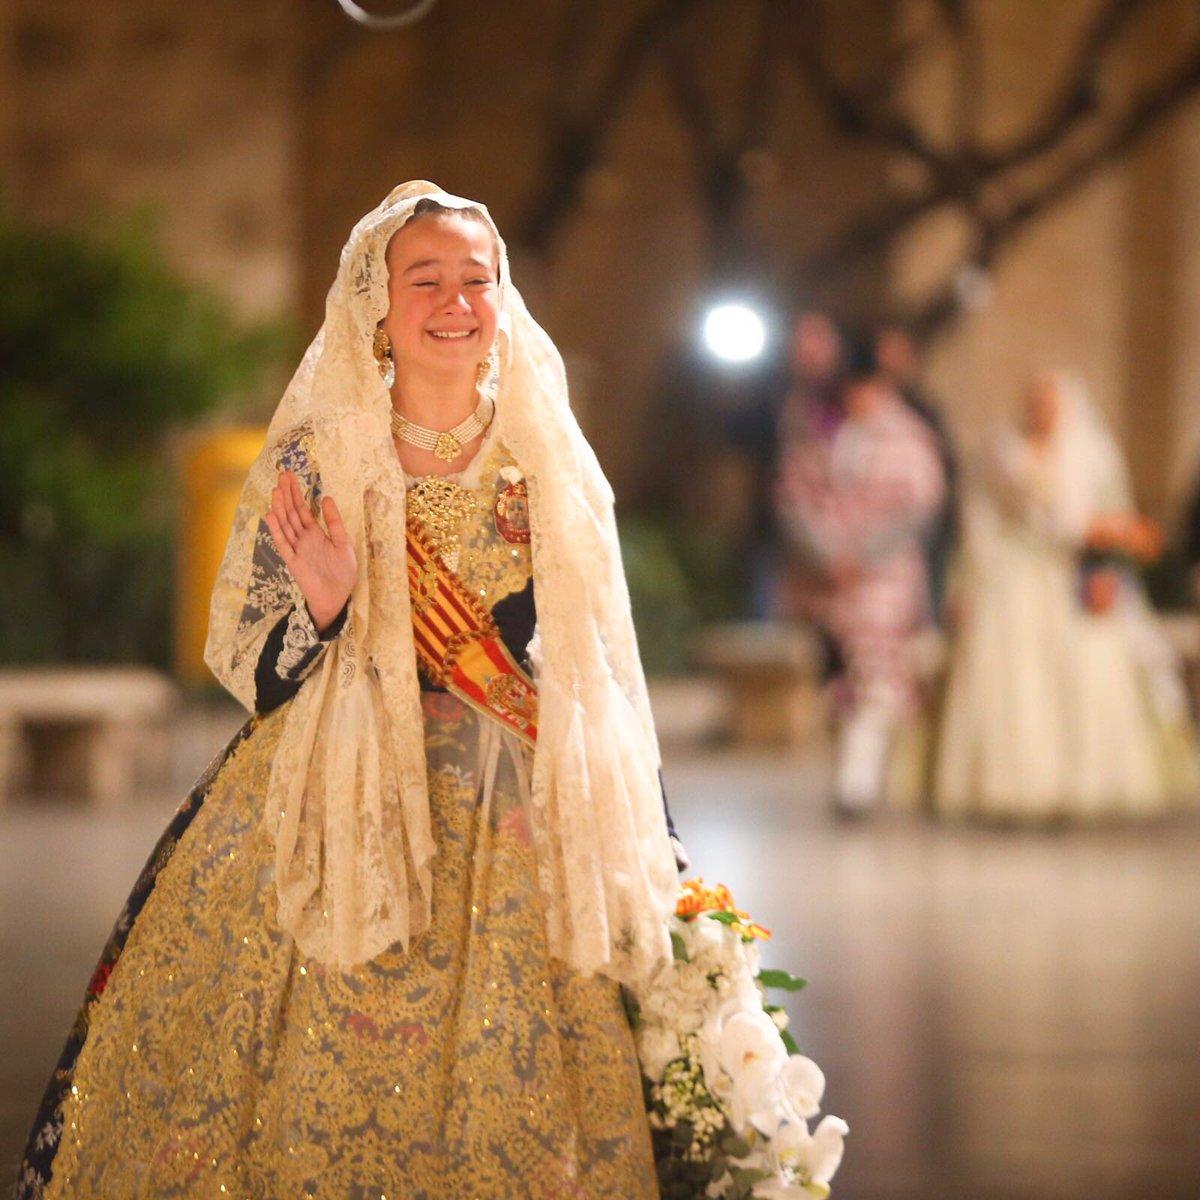 Una emocionada Daniela Gómez cierra la primera jornada de Ofrenda a la 'Mareta'